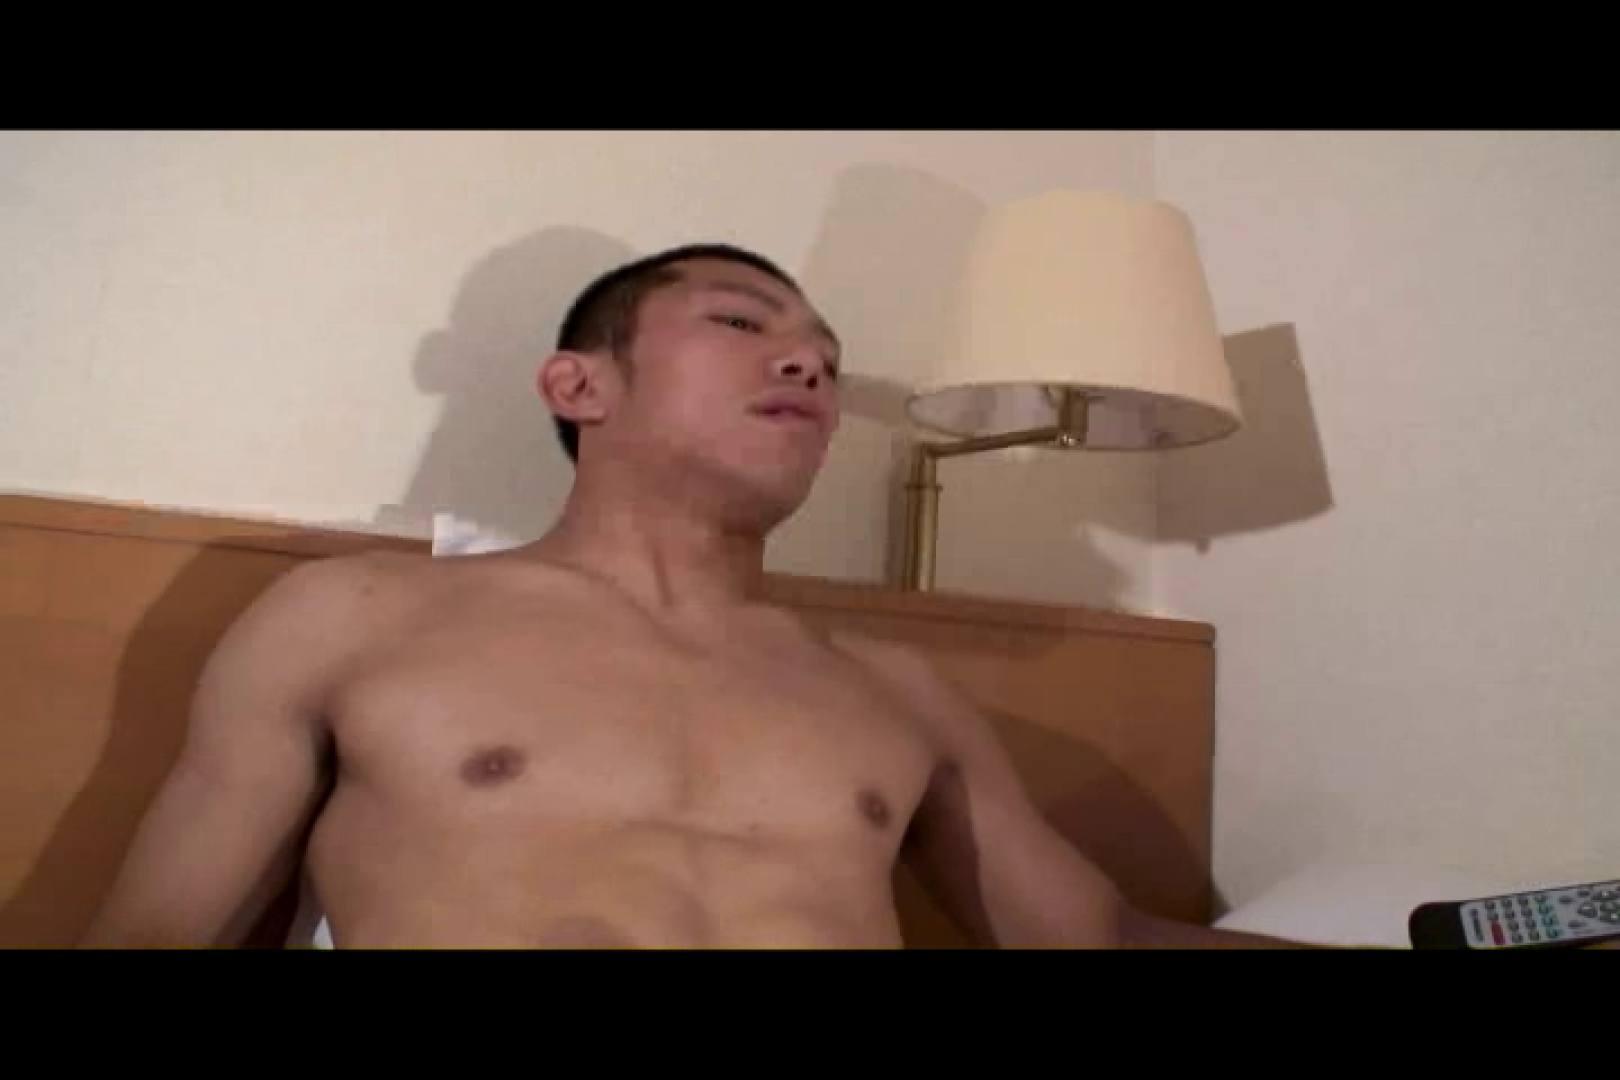 Bistro「イケメン」~Mokkori和風仕立て~vol.04 オナニー アダルトビデオ画像キャプチャ 91枚 19